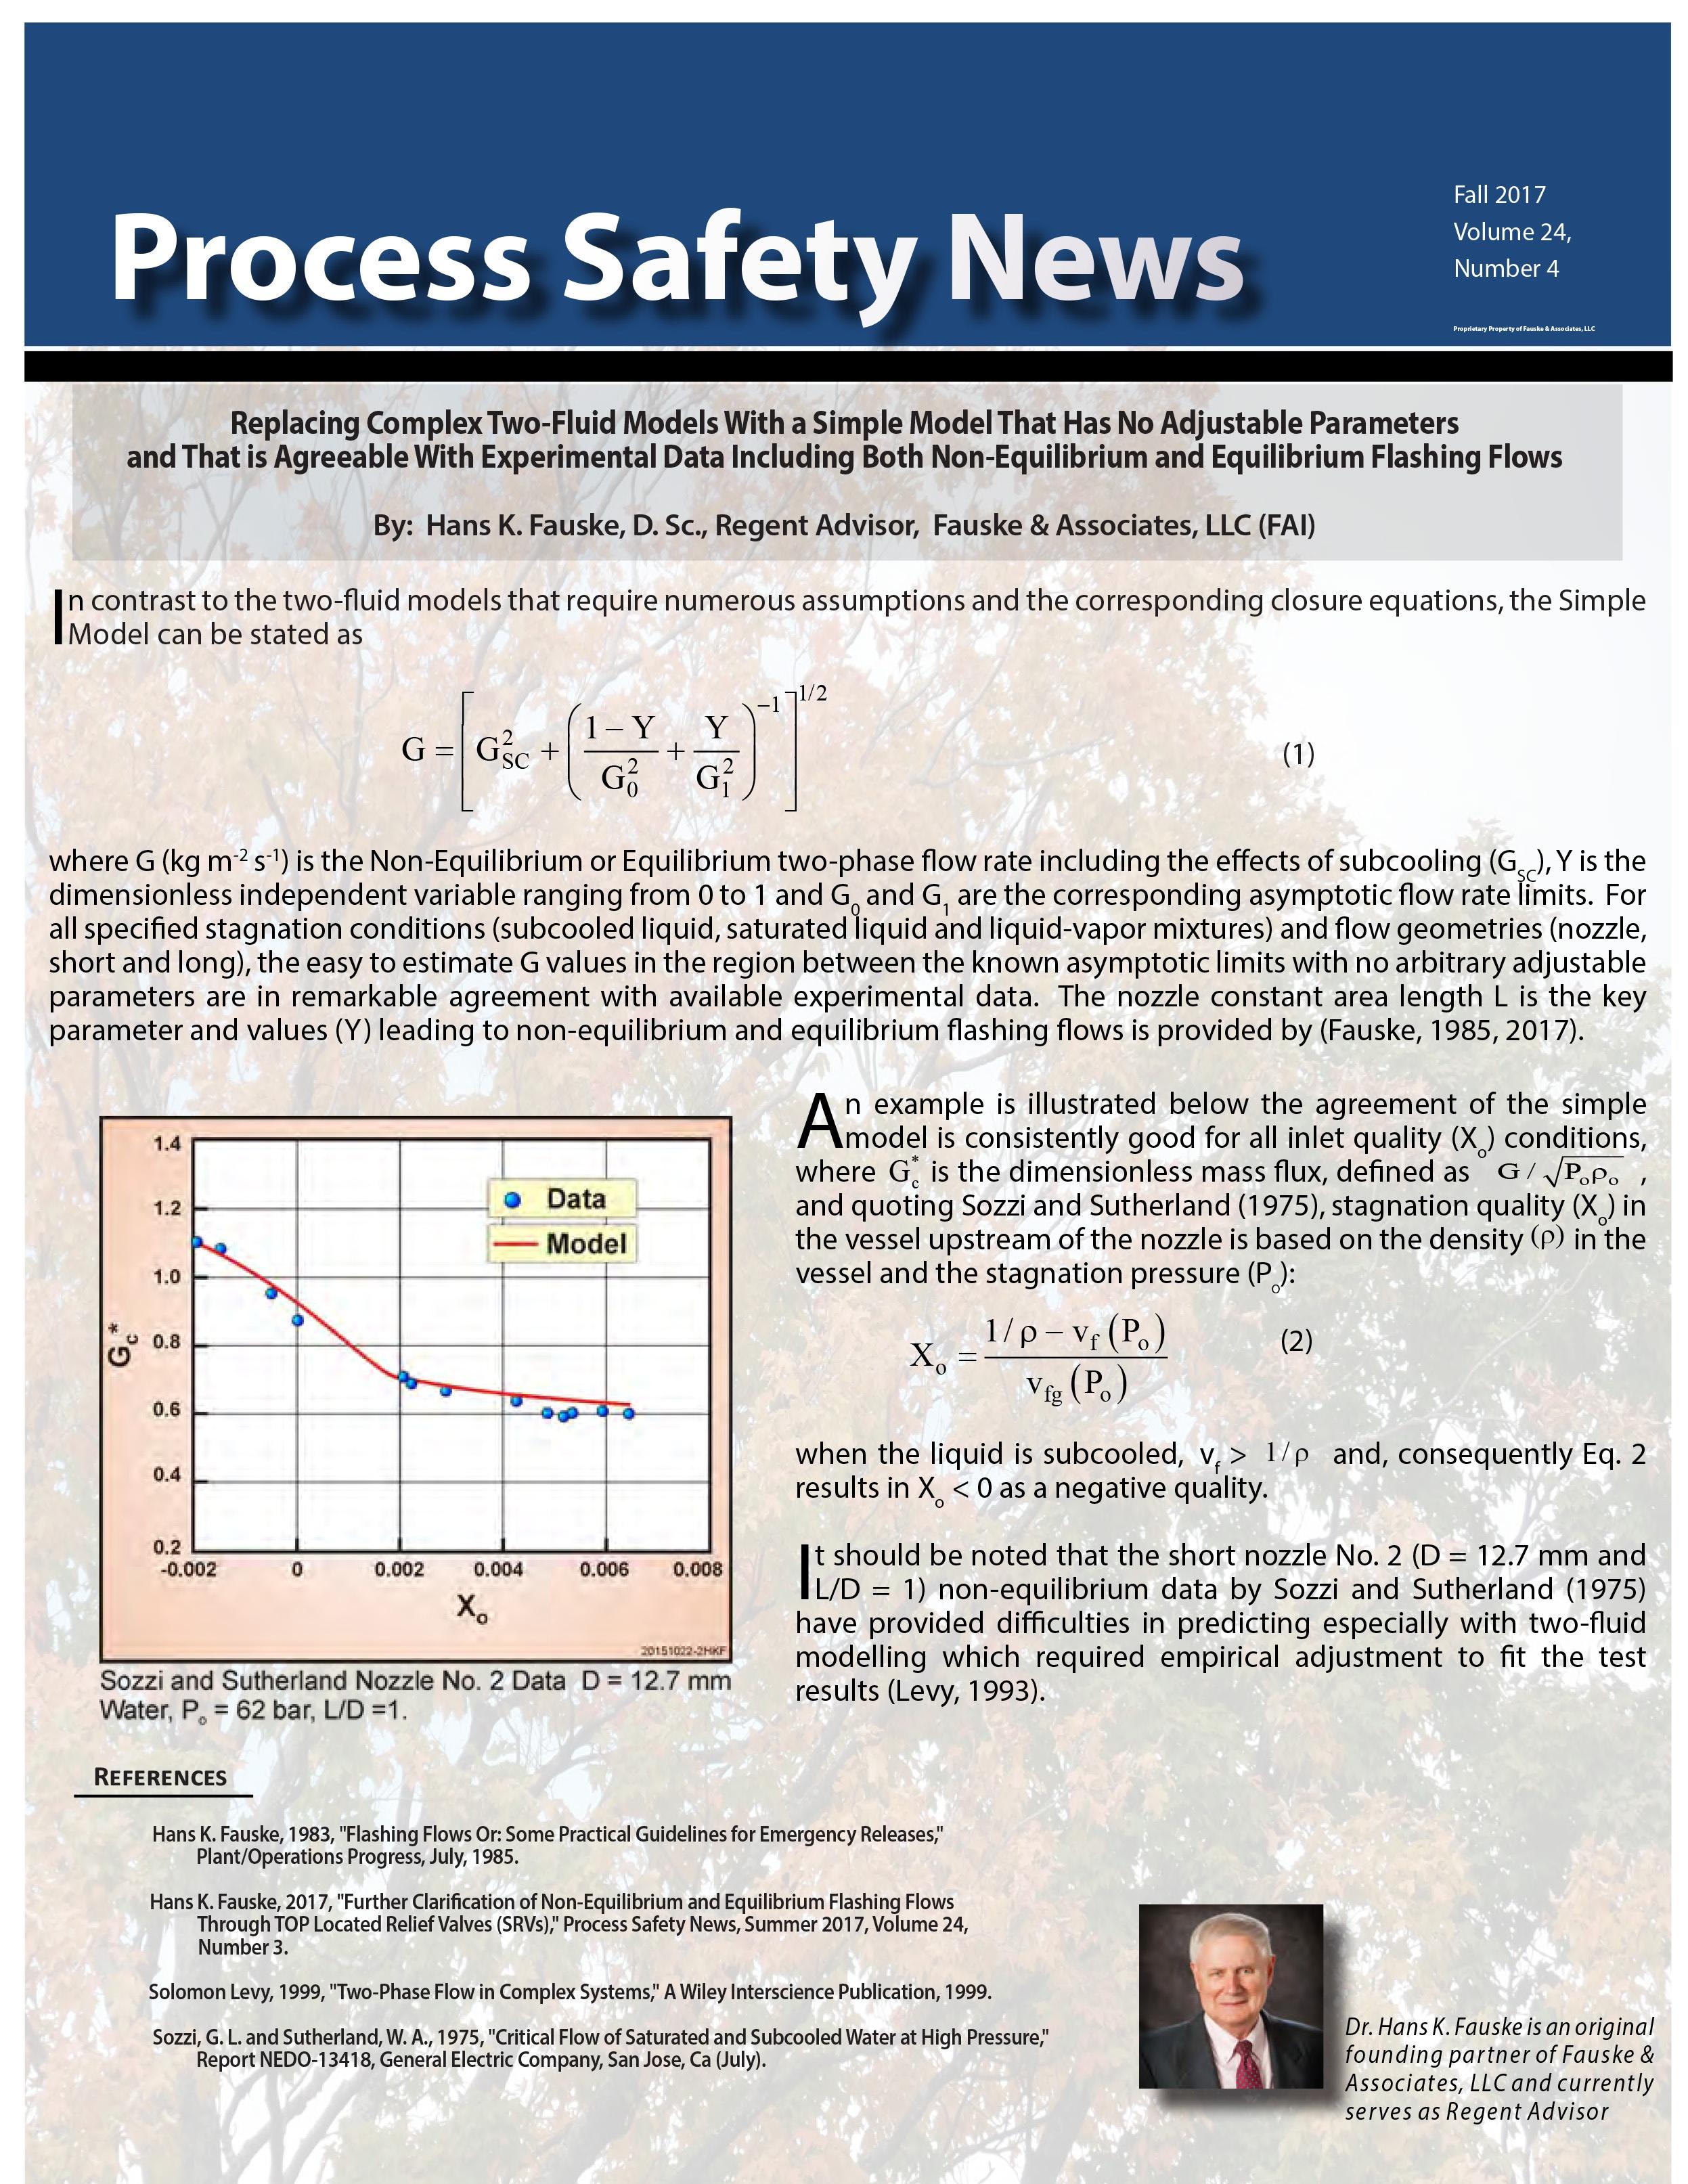 FAI Fall 2017 Process Safety News